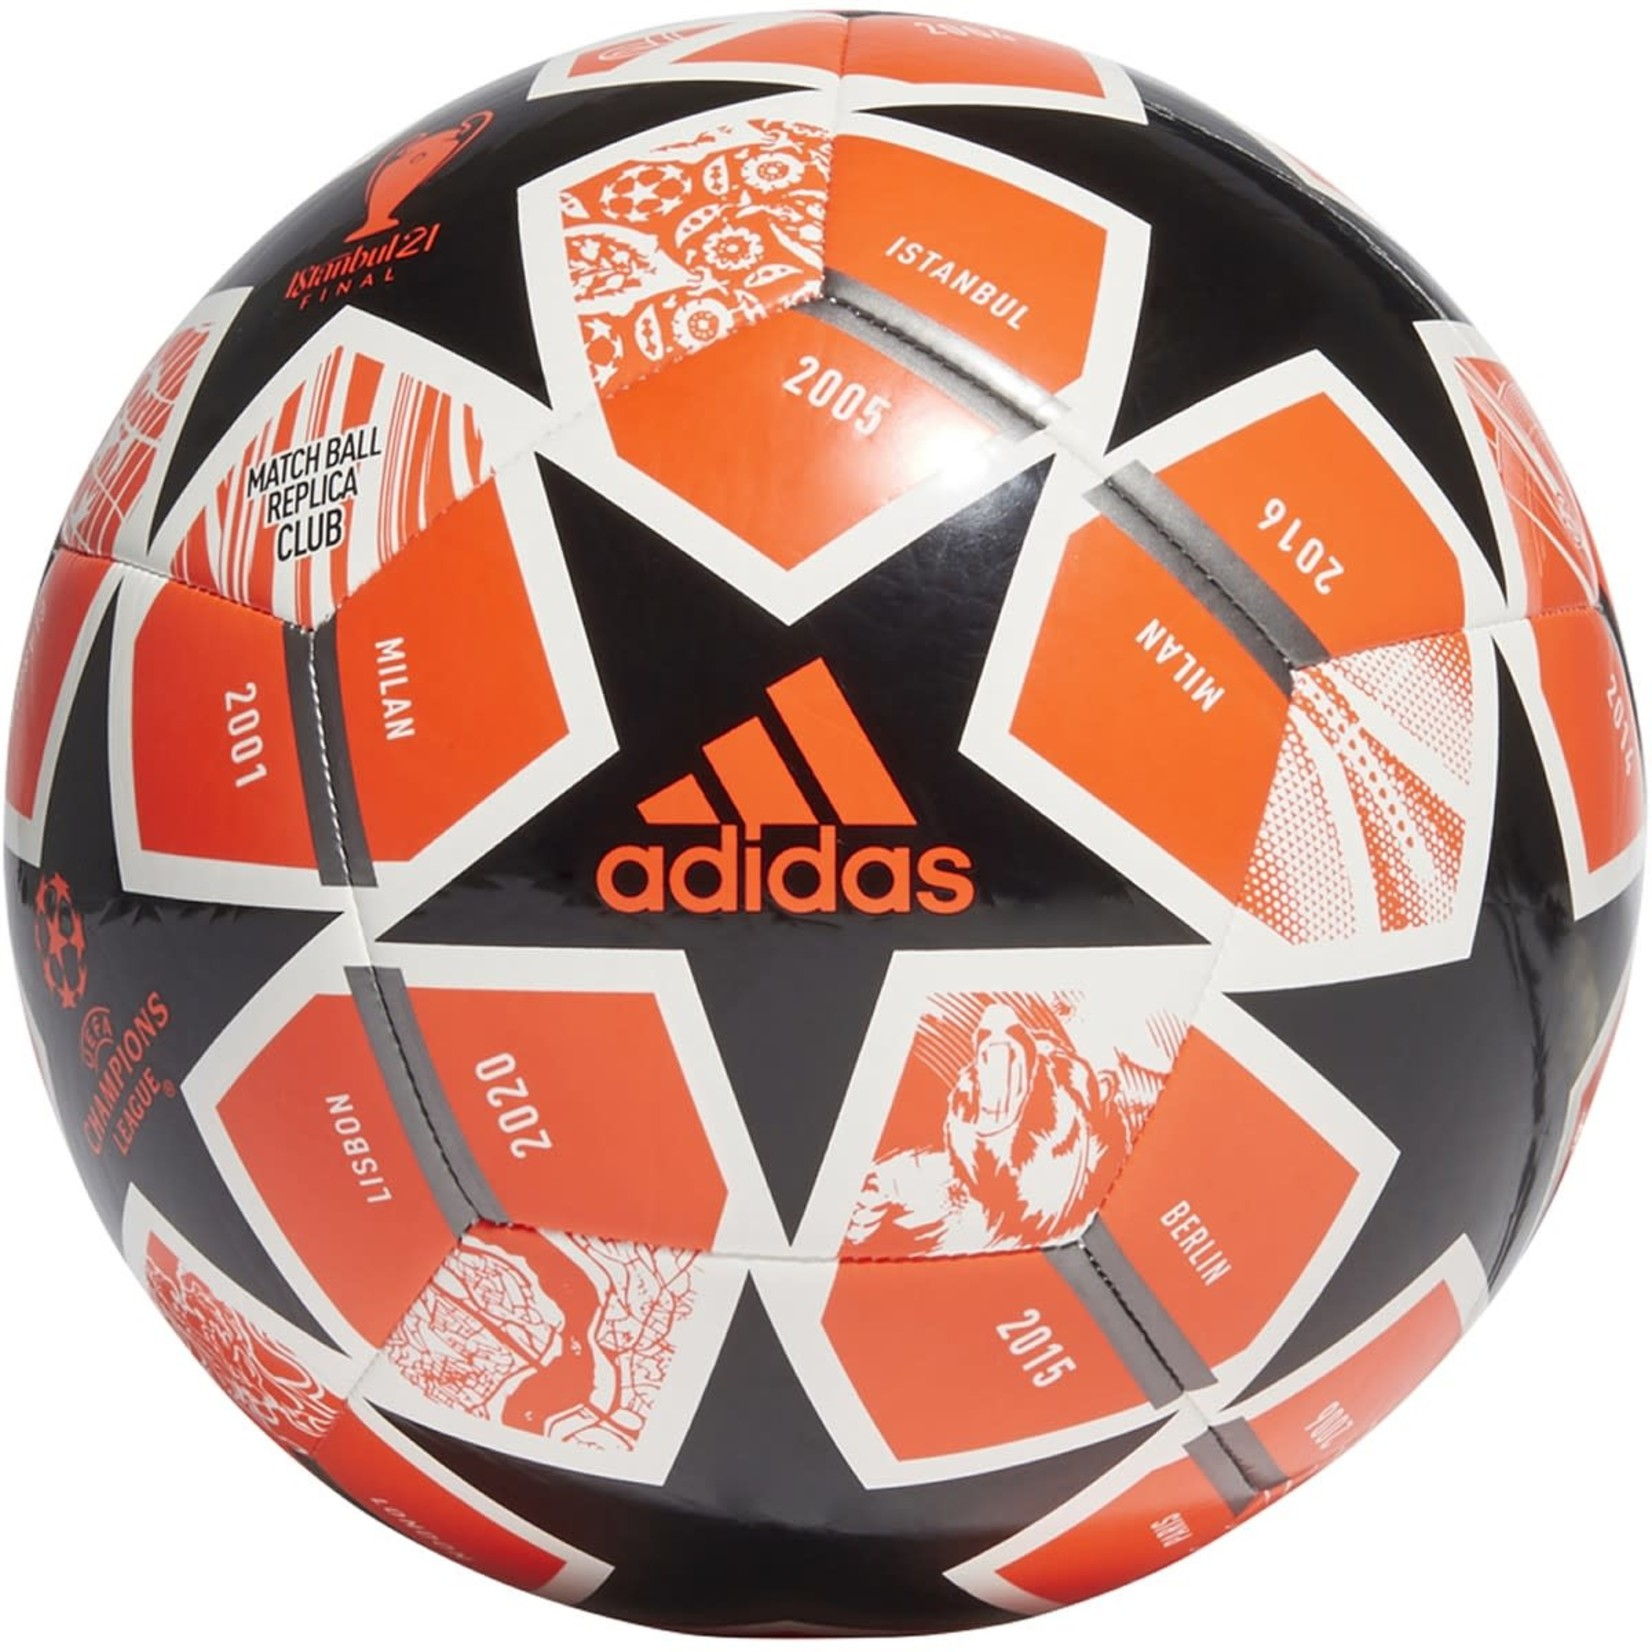 ADIDAS FINALE 21 20TH ANNIVERSARY UCL CLUB BALL (BLACK/ORANGE)